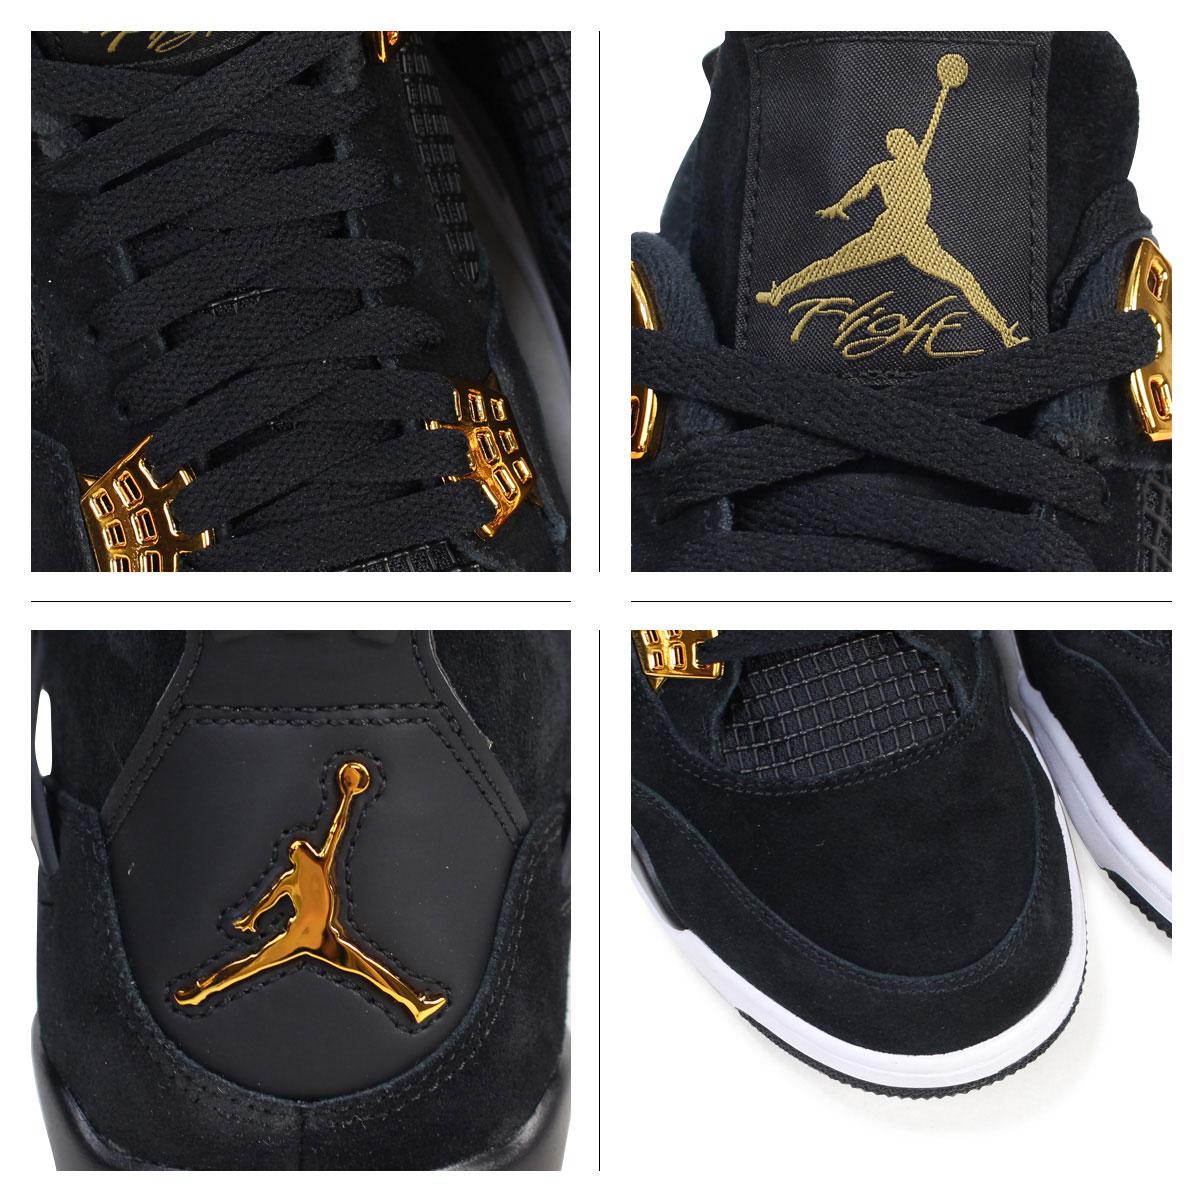 19db8e2b484 ... Nike NIKE Air Jordan 4 nostalgic sneakers AIR JORDAN 4 RETRO ROYALTY  308,497-032 men's ...